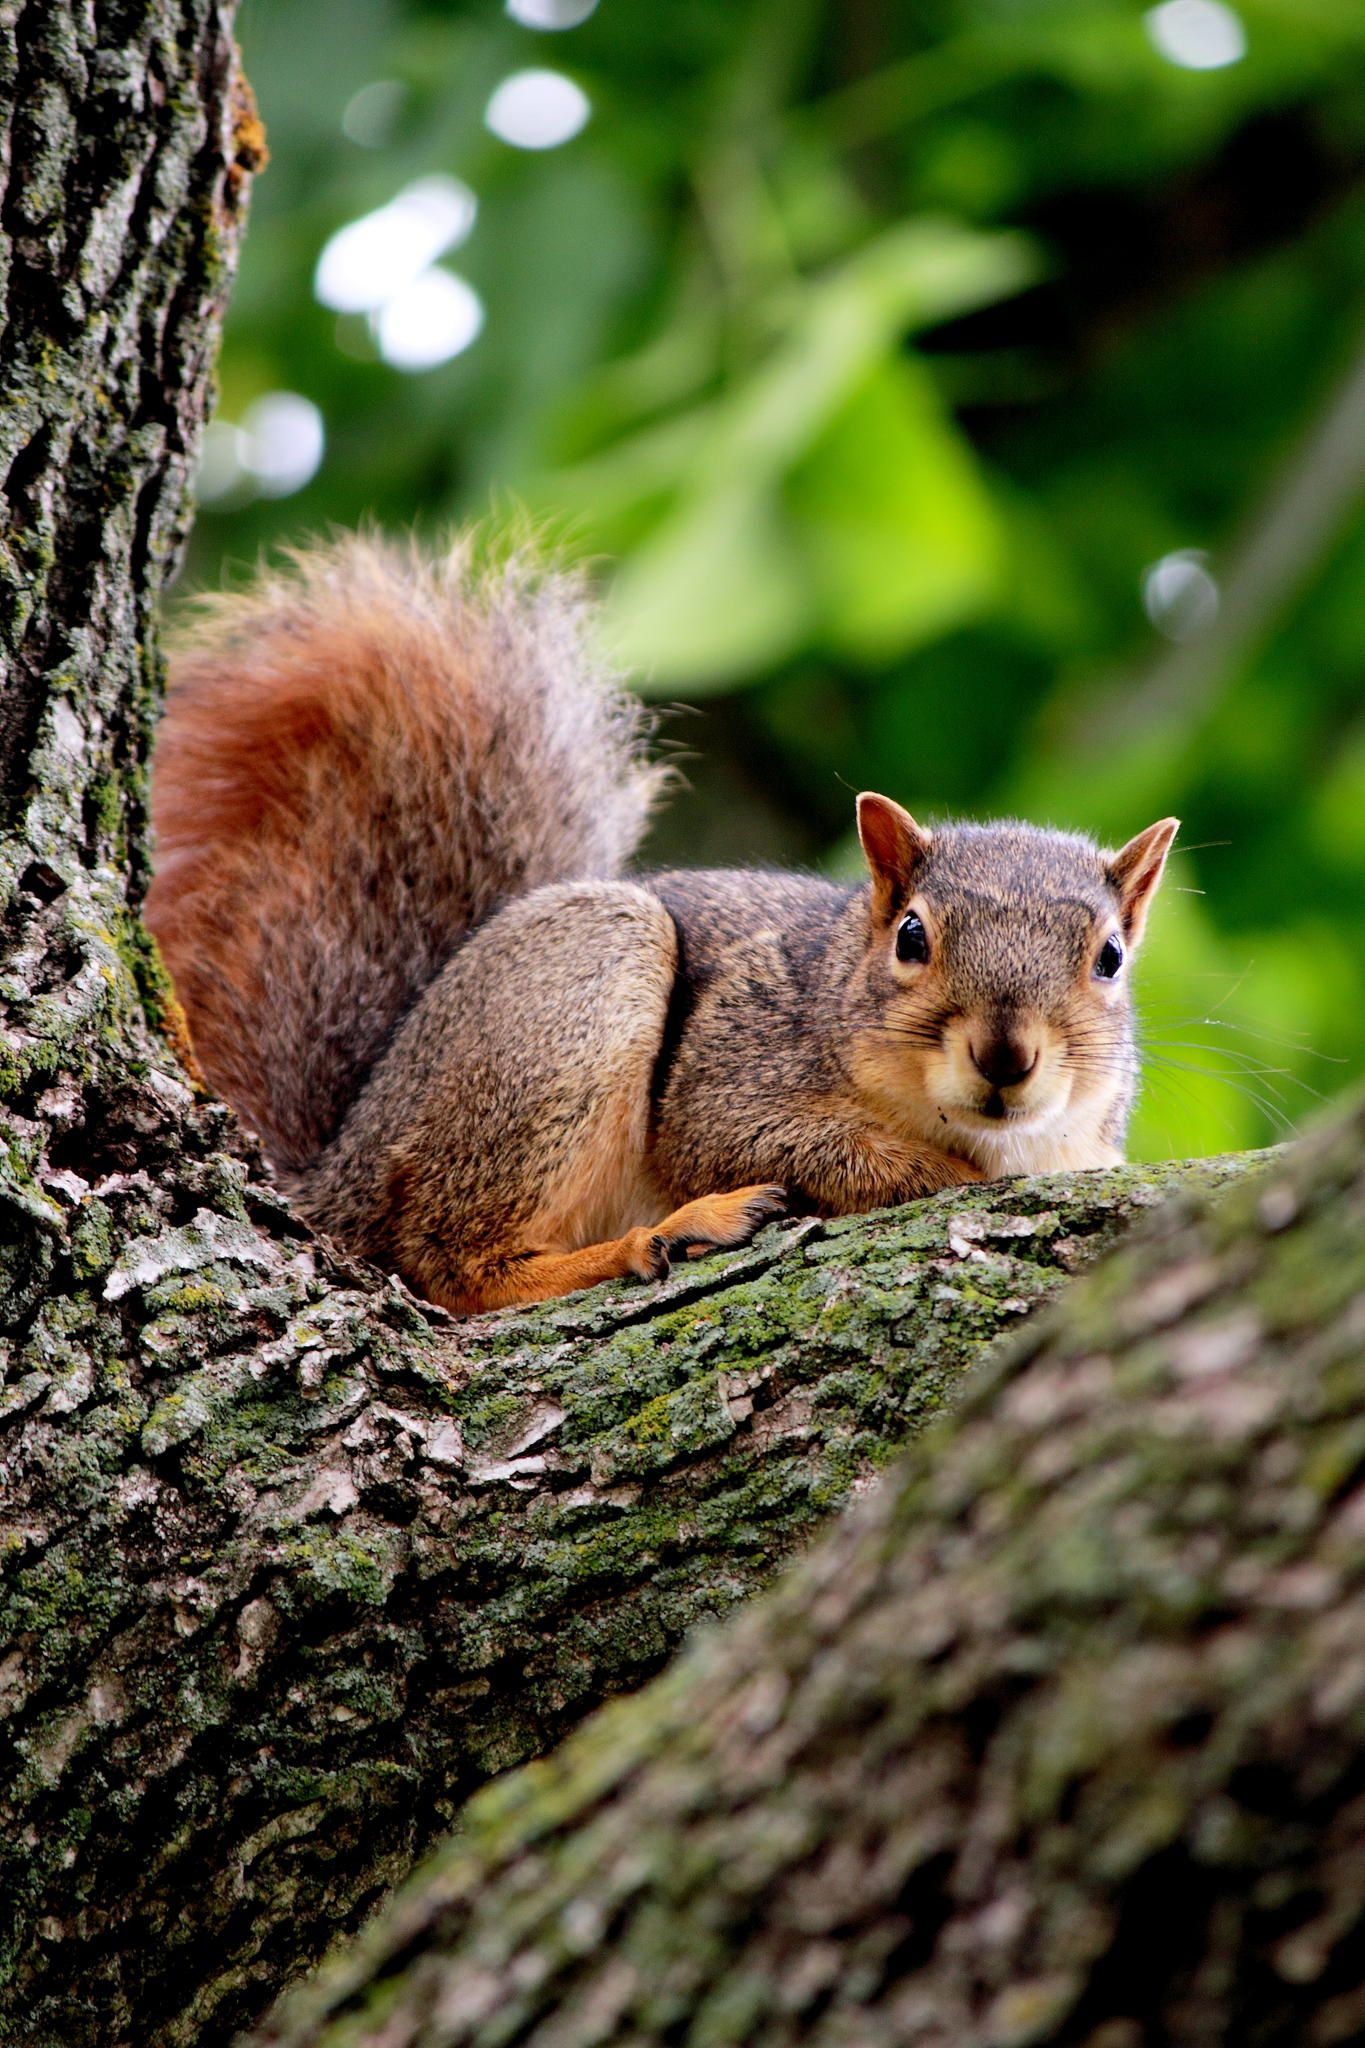 Small Animal Reptiles And Amphibian Habitats: Squirrel .... Don't Come Near Me!